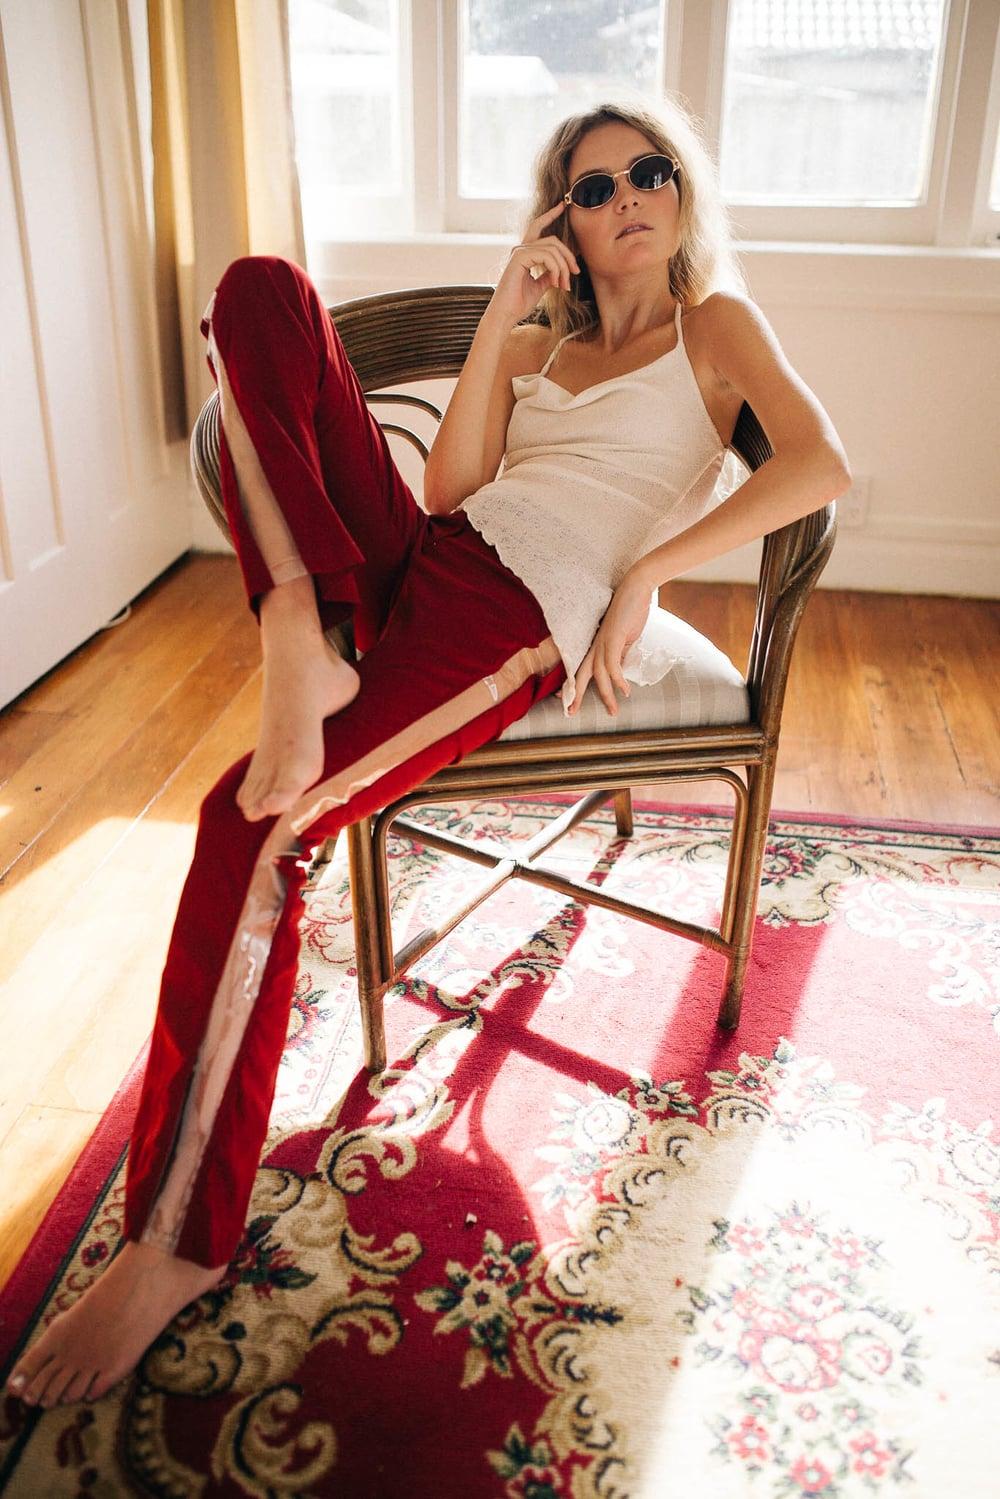 Ellen Richardson - Fashion - Girls Money Club 1-1.jpg